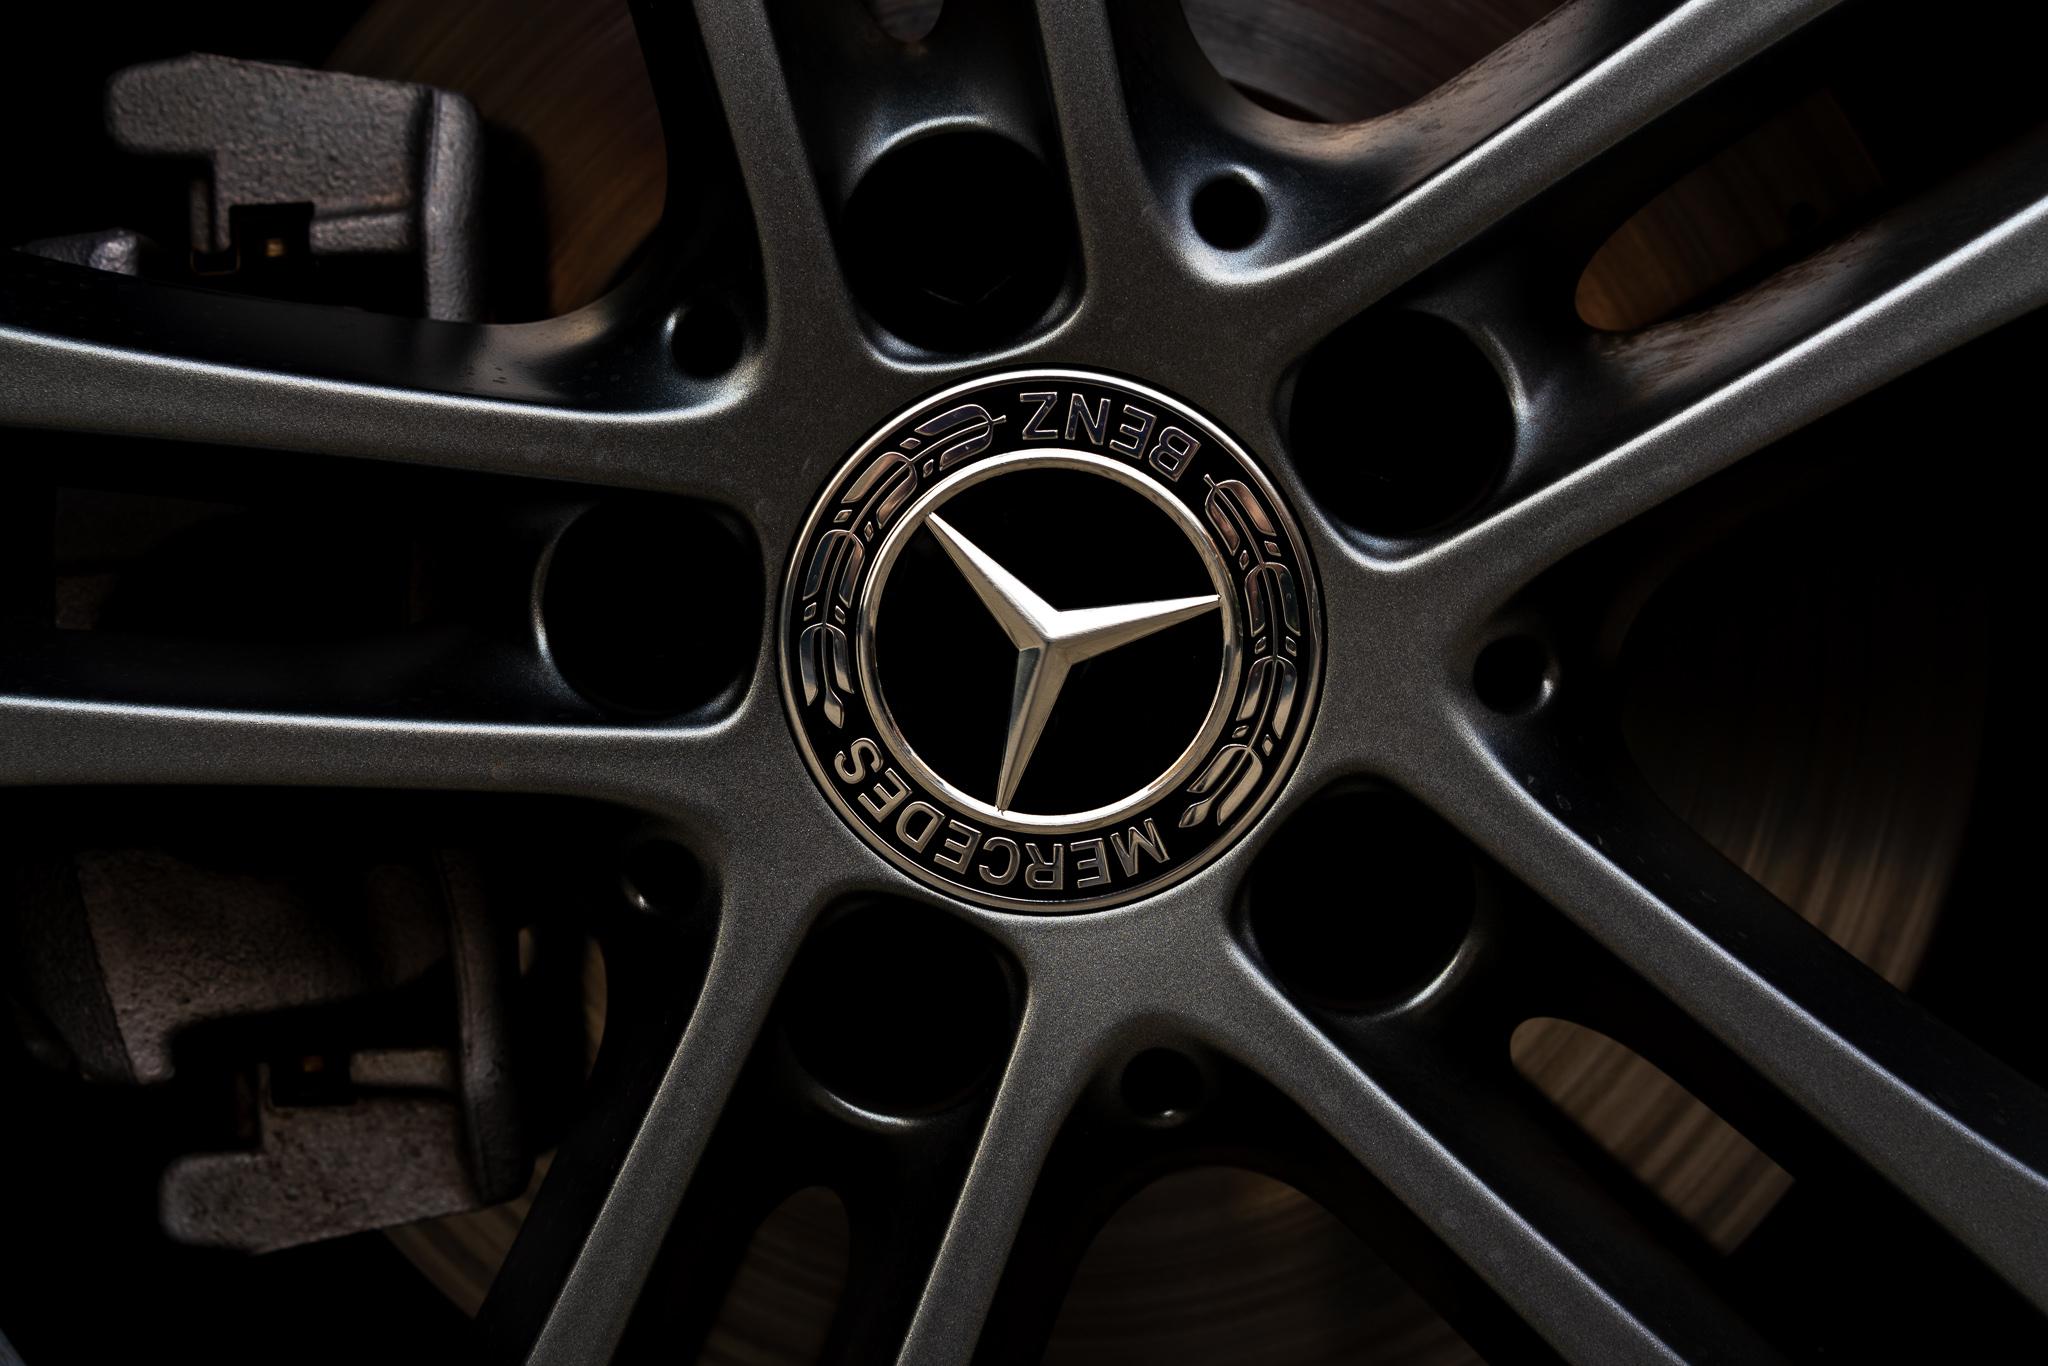 Mercedes Classe A logo cerchio